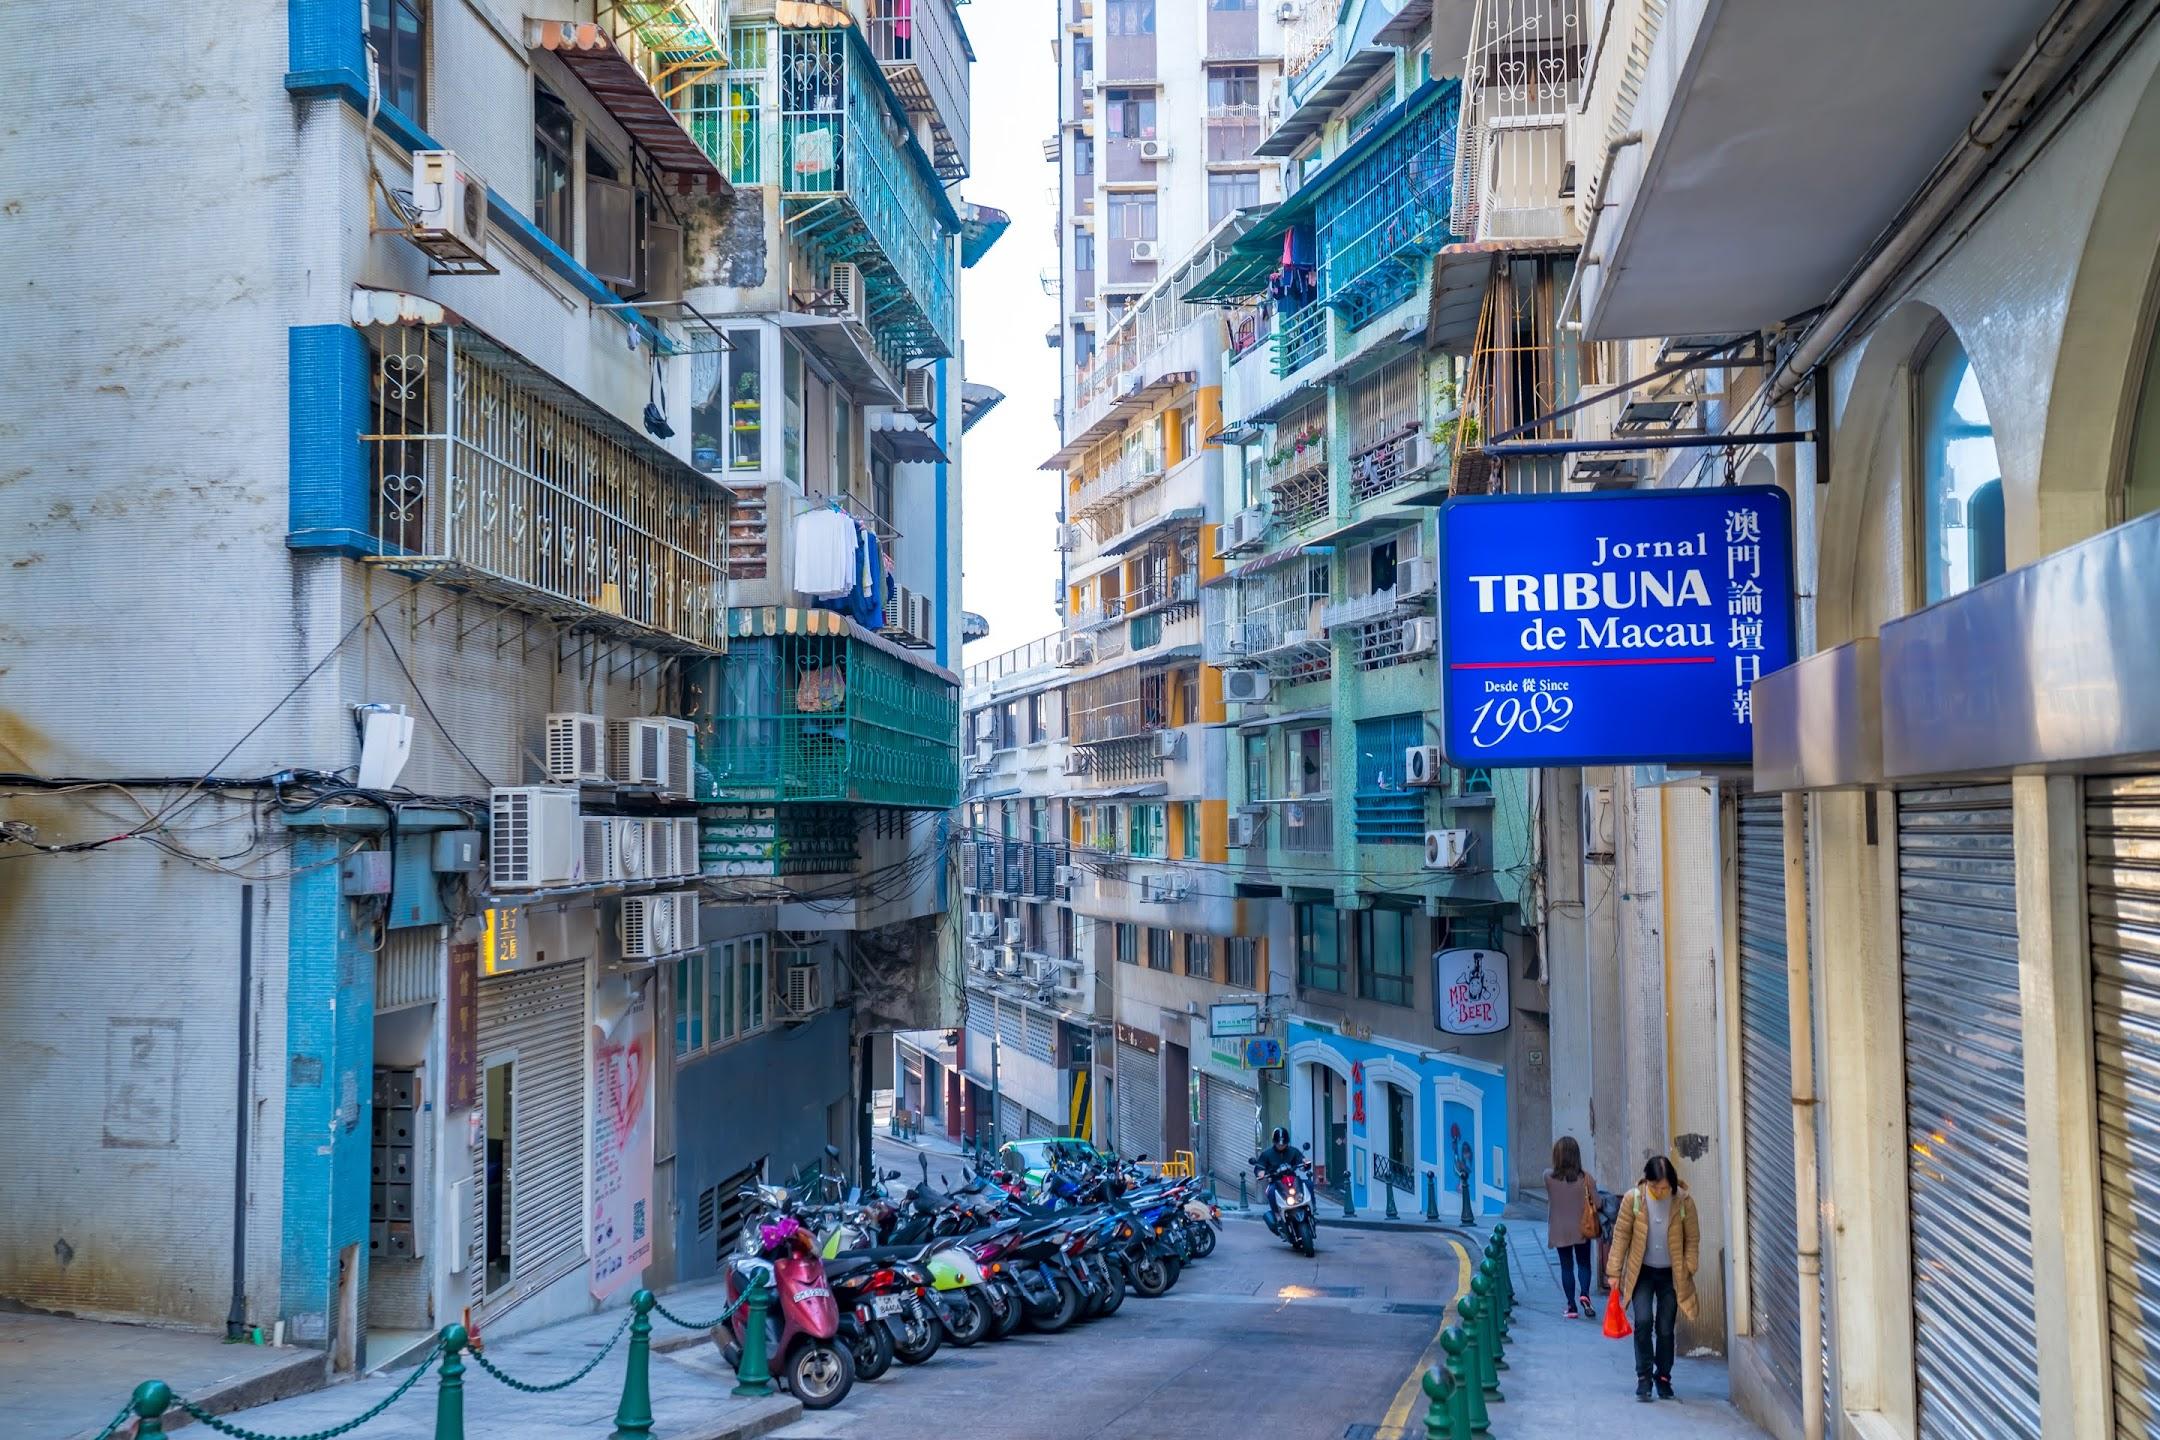 Macau off-street7